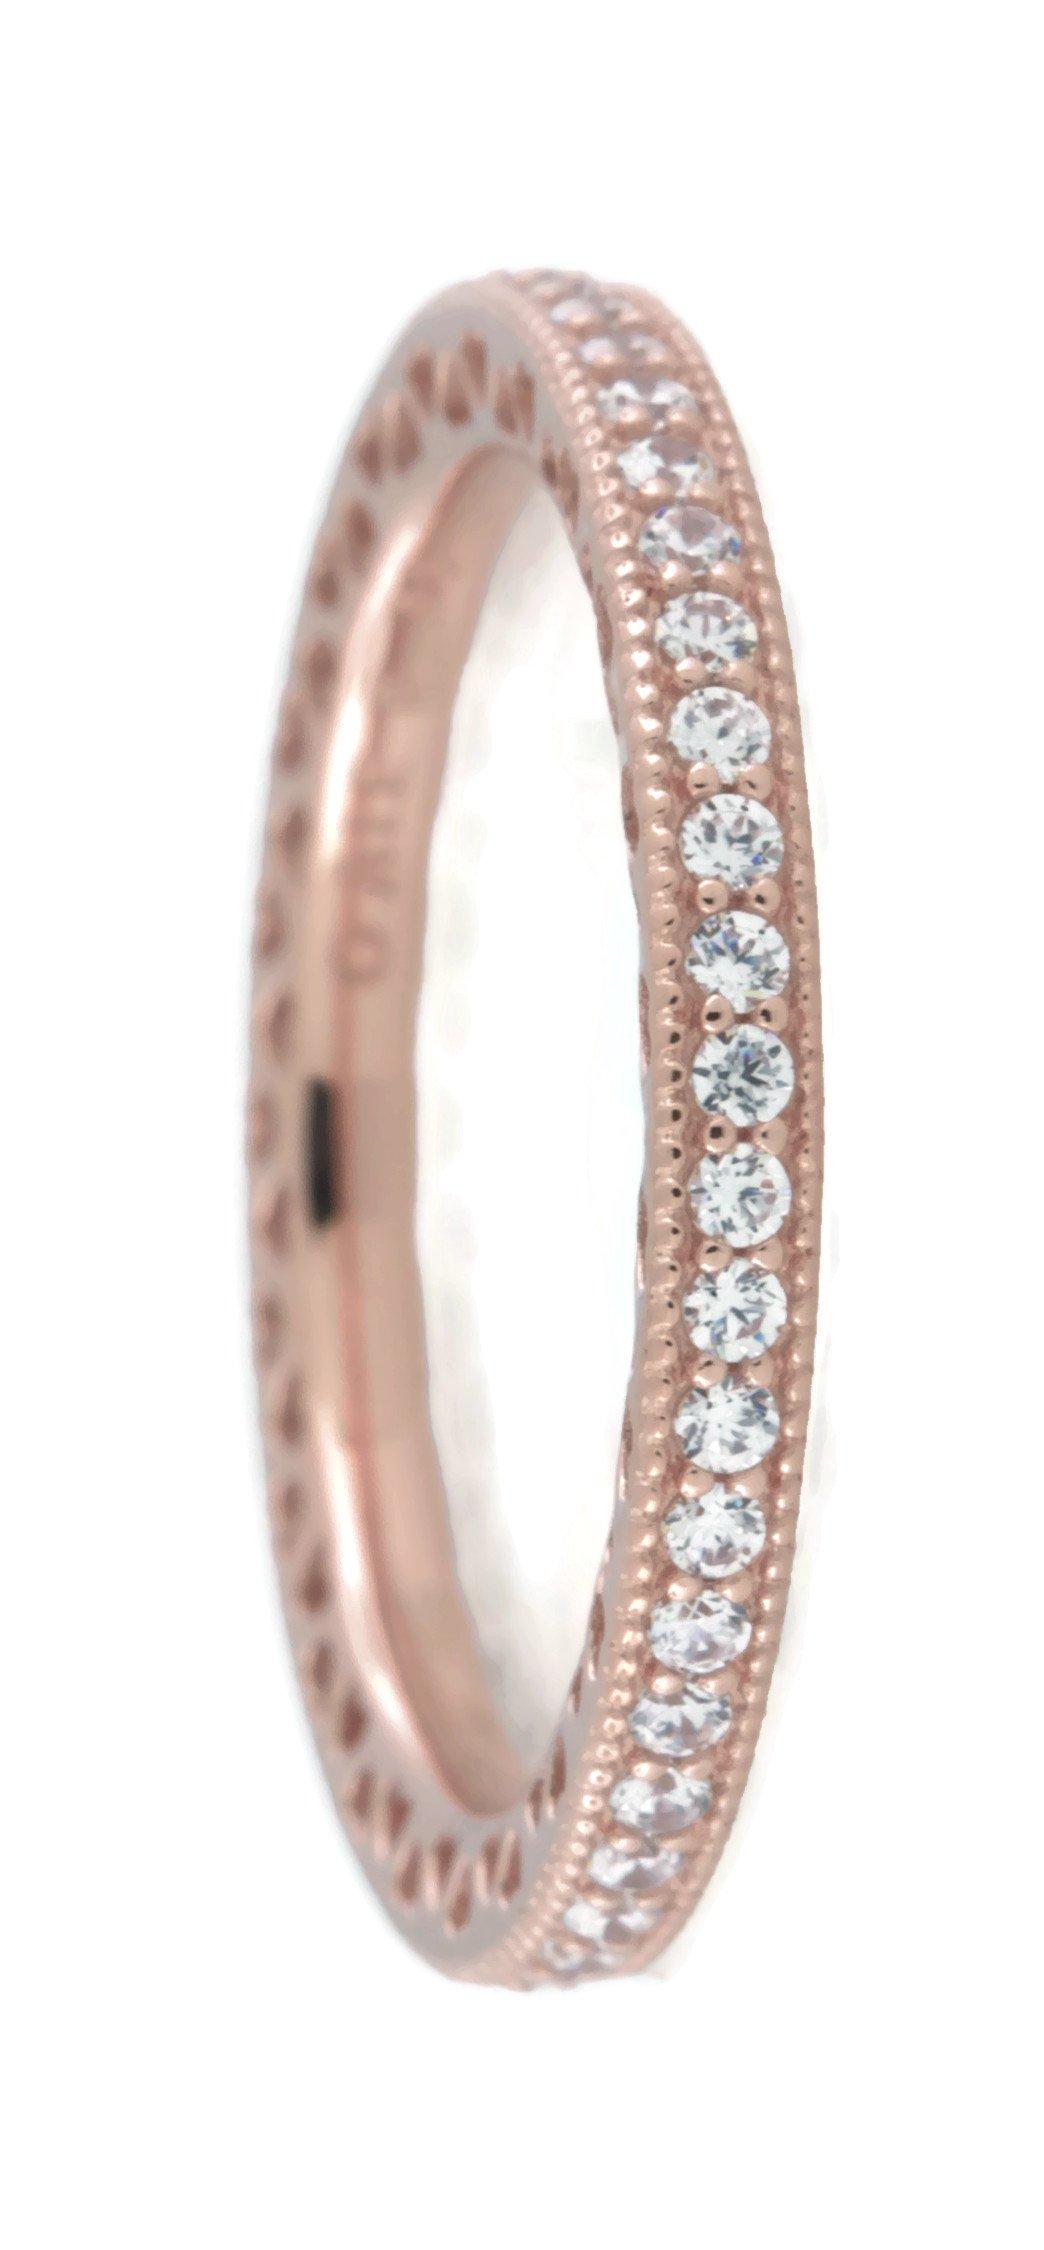 PANDORA Hearts of PANDORA Ring, Rose Gold And Clear CZ, 180963CZ (50)